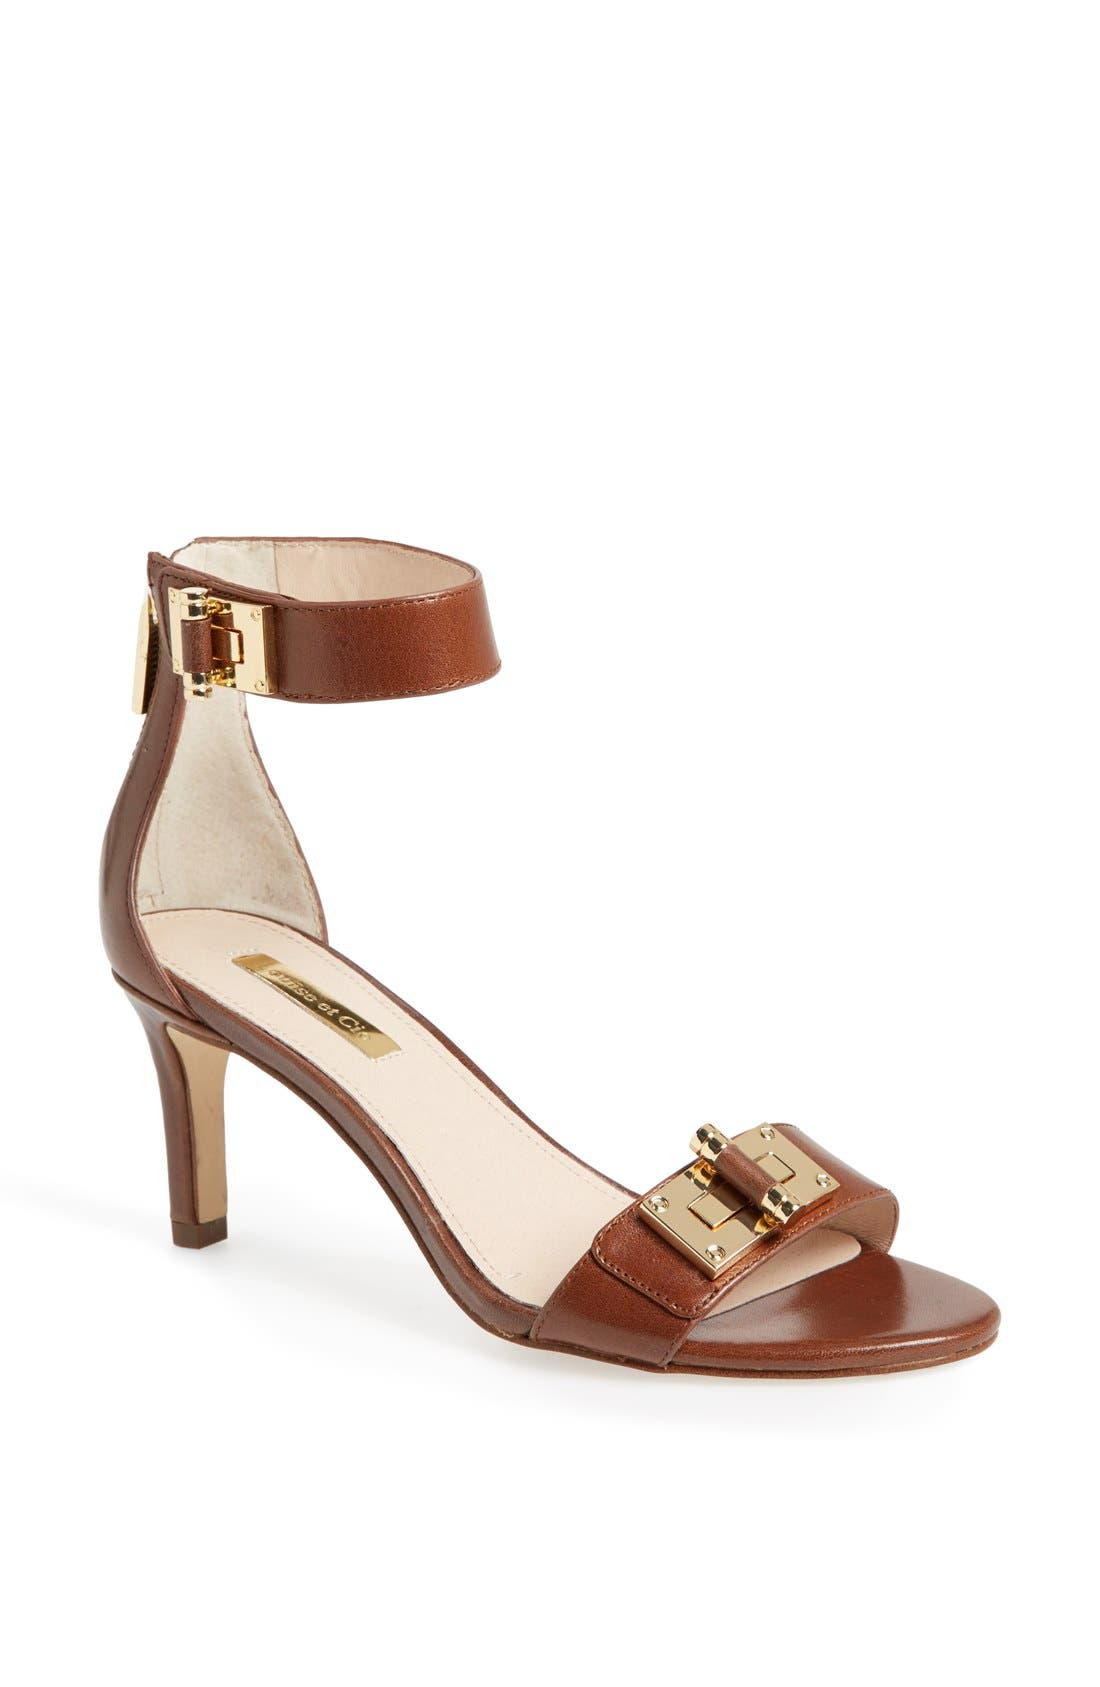 Main Image - Louise et Cie 'Kaliope' Sandal